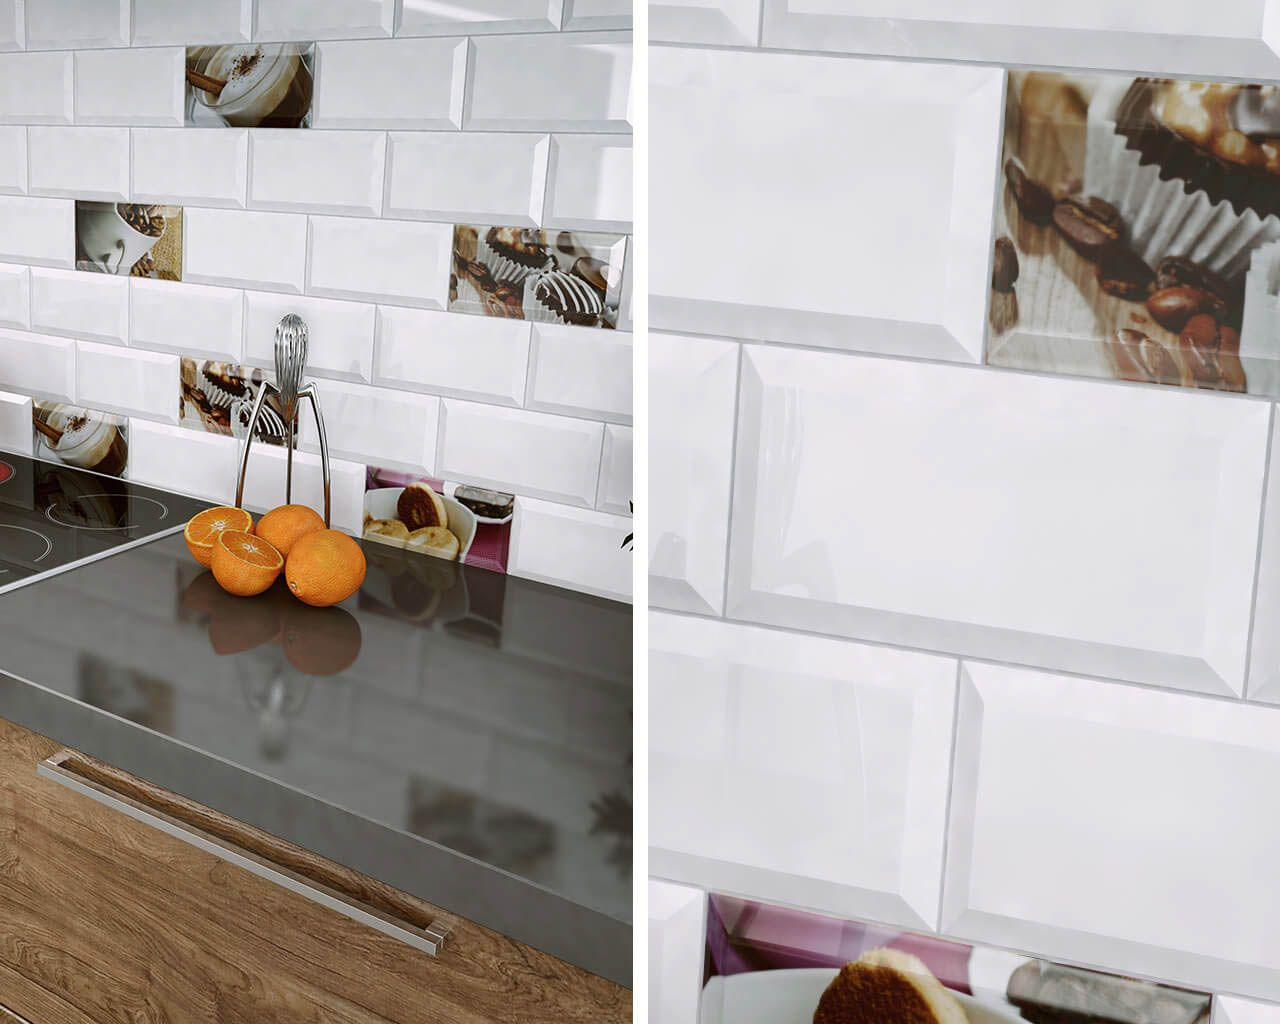 Tamoe Płytki Cegiełki Kwadratowe I Prostokątne Ceramika